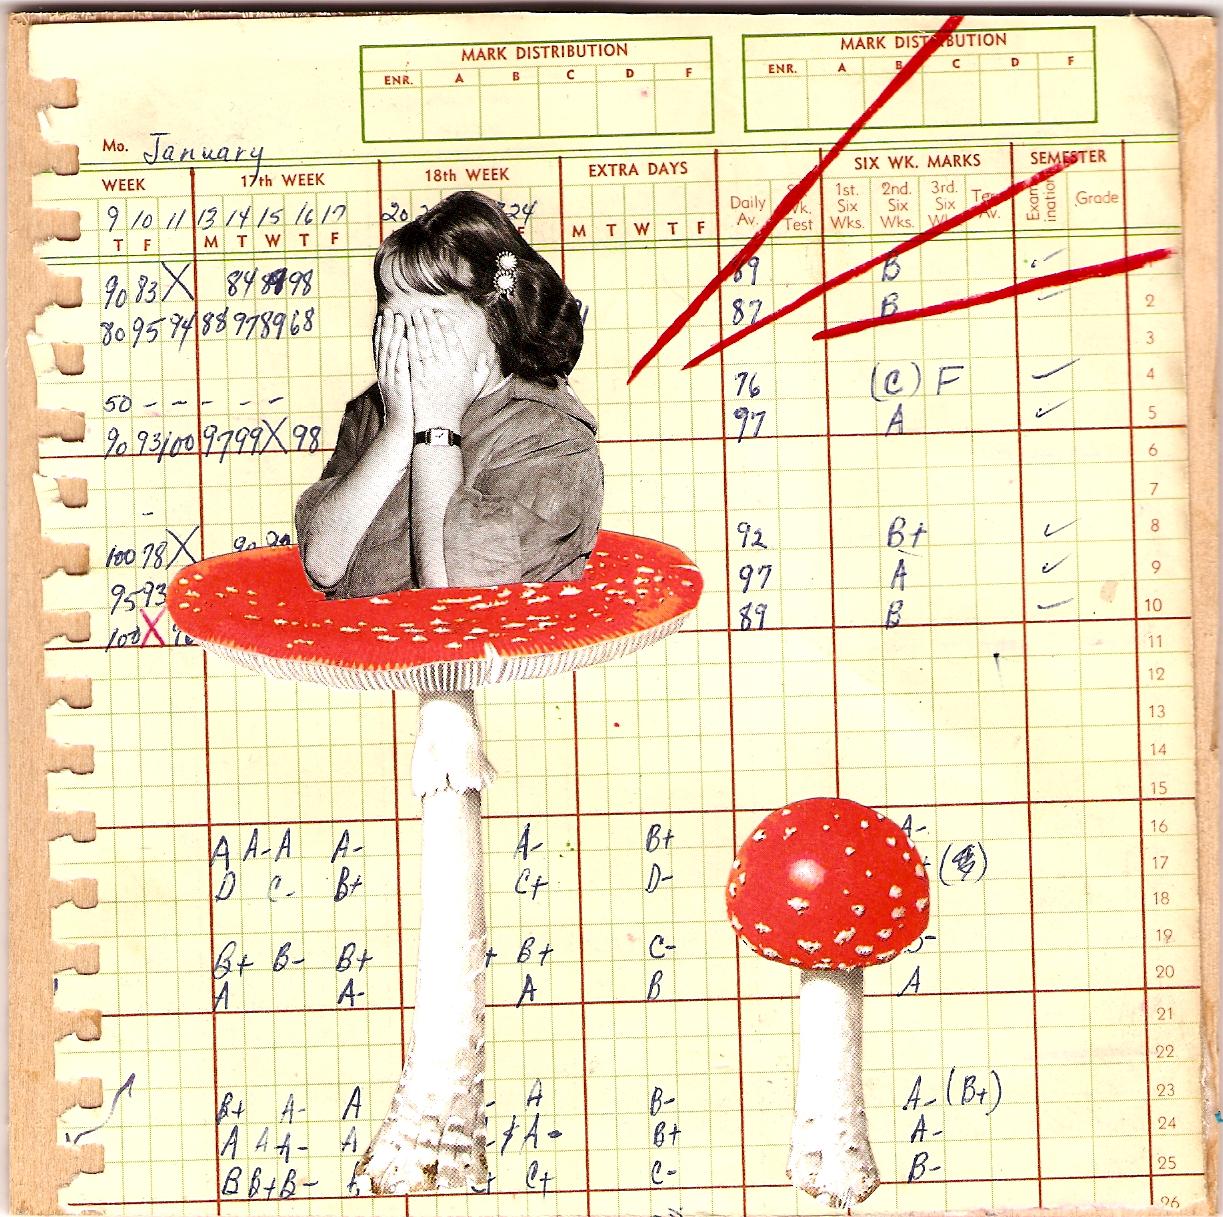 mushroomgirl2.png